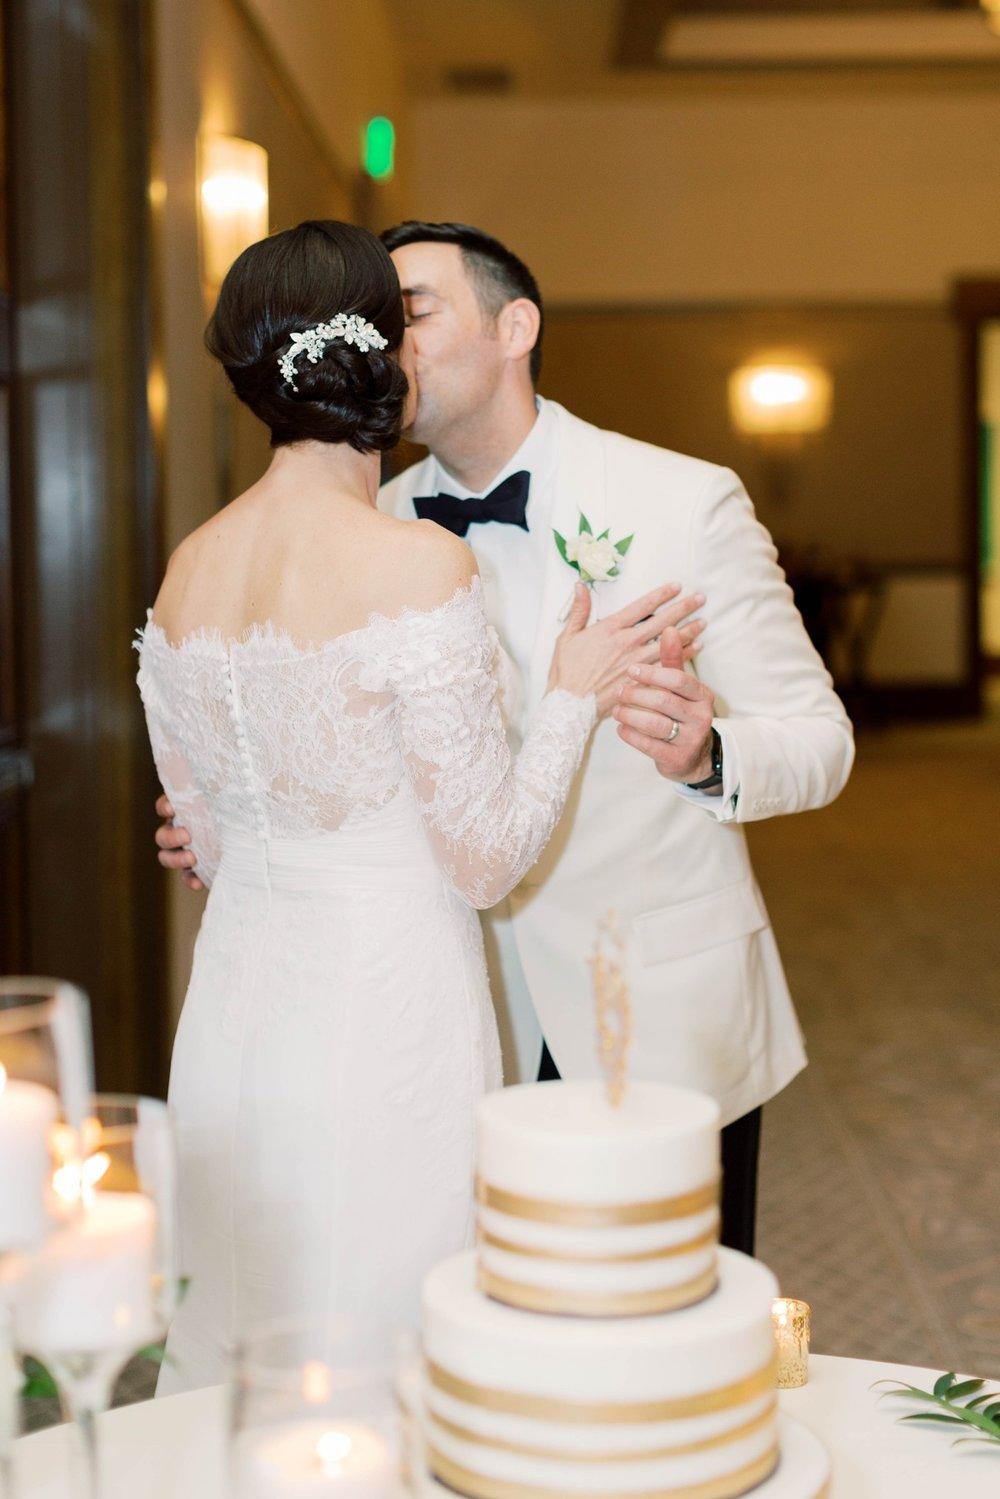 Alfond-Inn-Wedding-Winter-Park-Wedding-Photographer-Chantell-Rae-Photography_0086.jpg